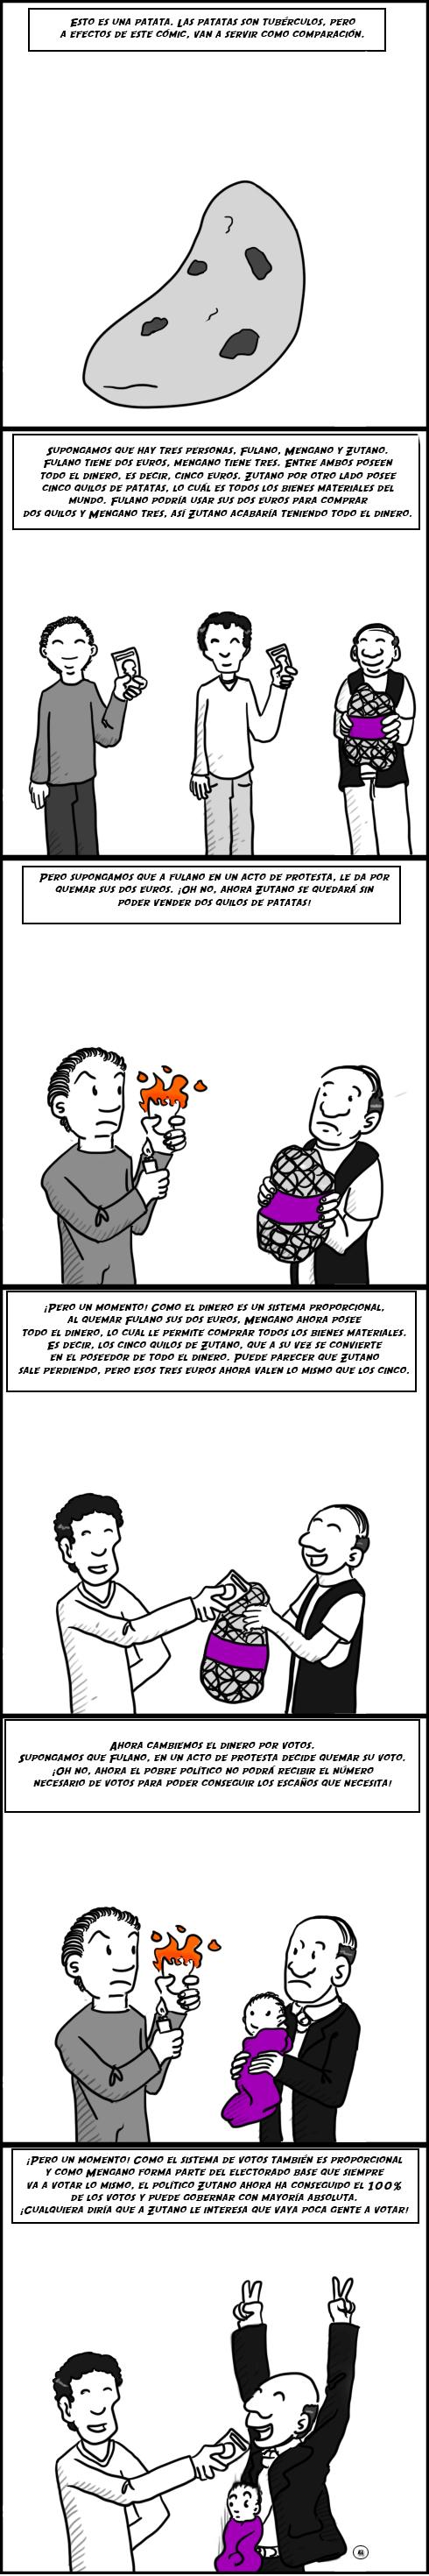 Tira0442